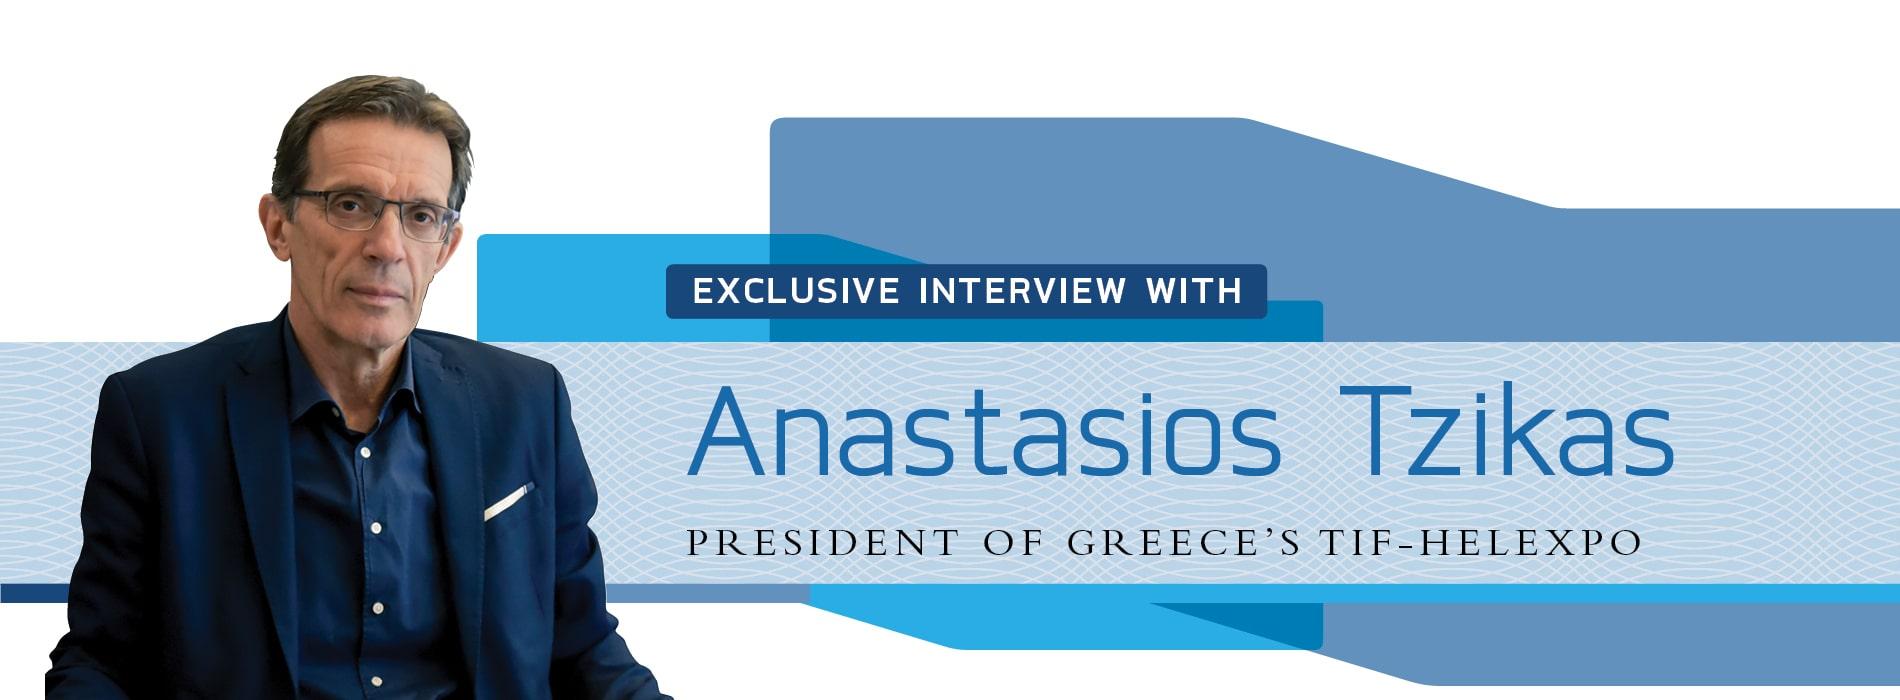 Interview with Anastasios Tzikas,President of Greece's TIF-Helexpo